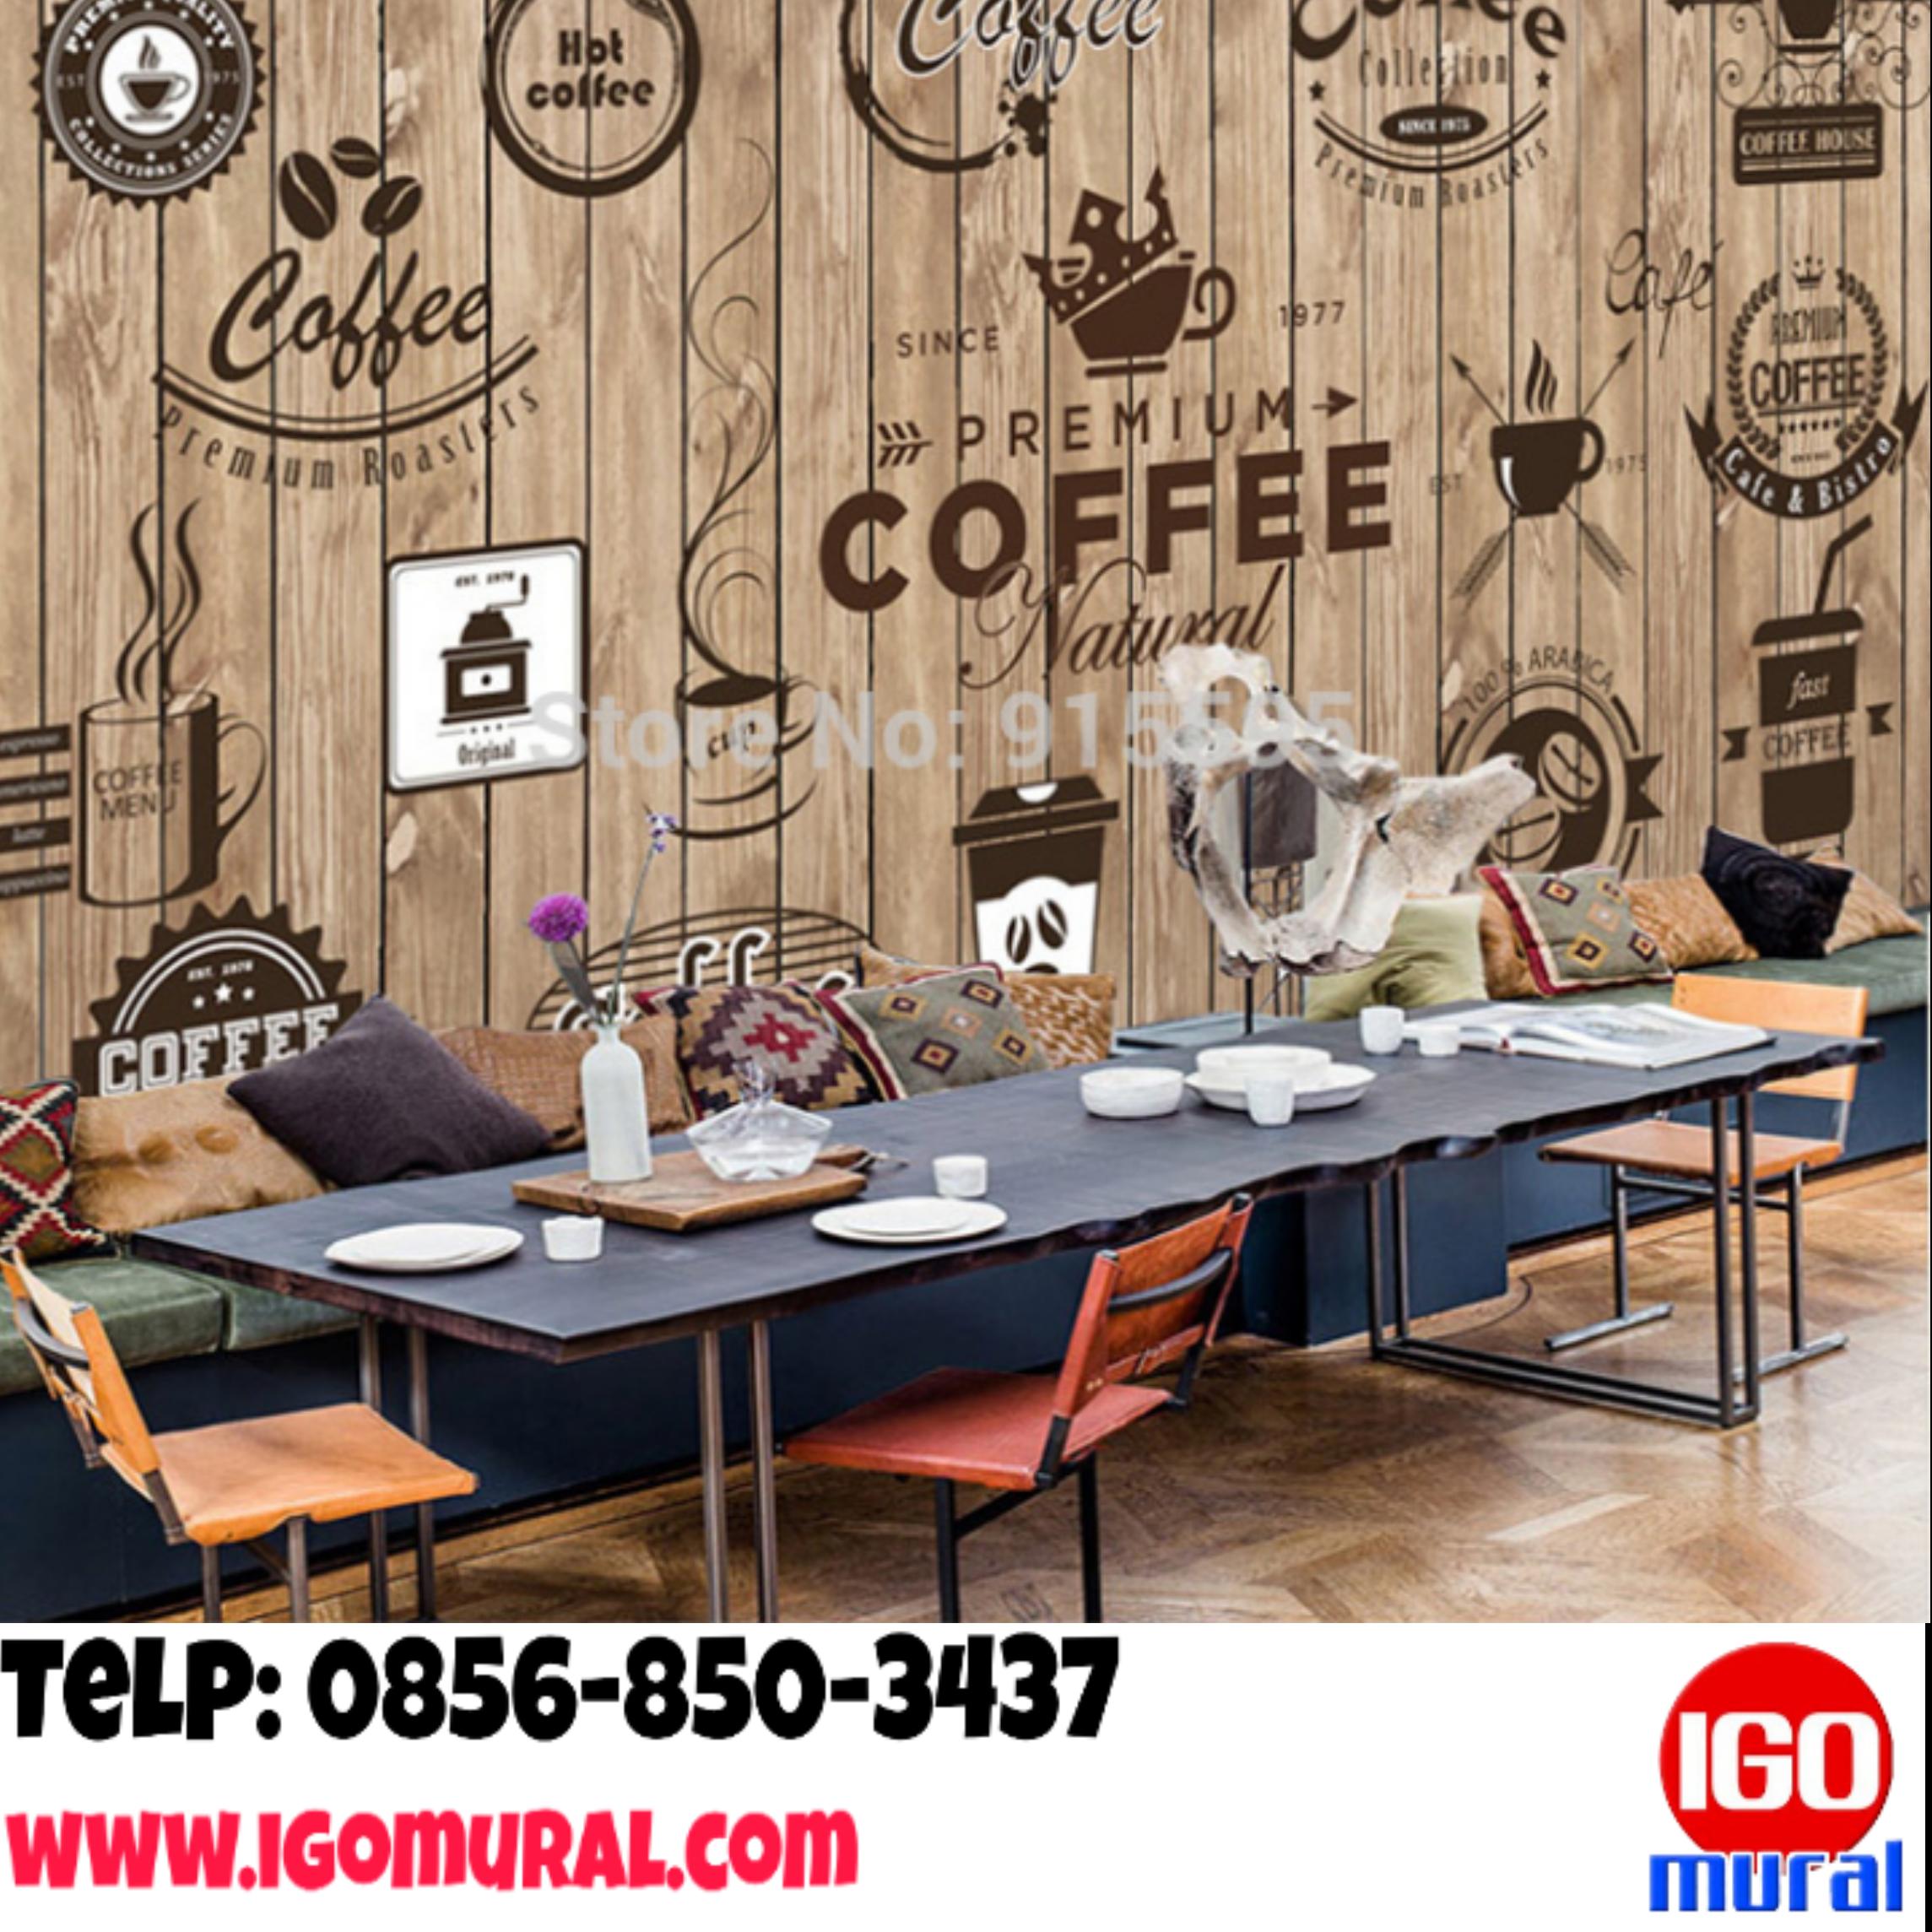 Profesional, Telp 0856-850-3437, Lukis Tembok Café, Lukisan Tembok ...